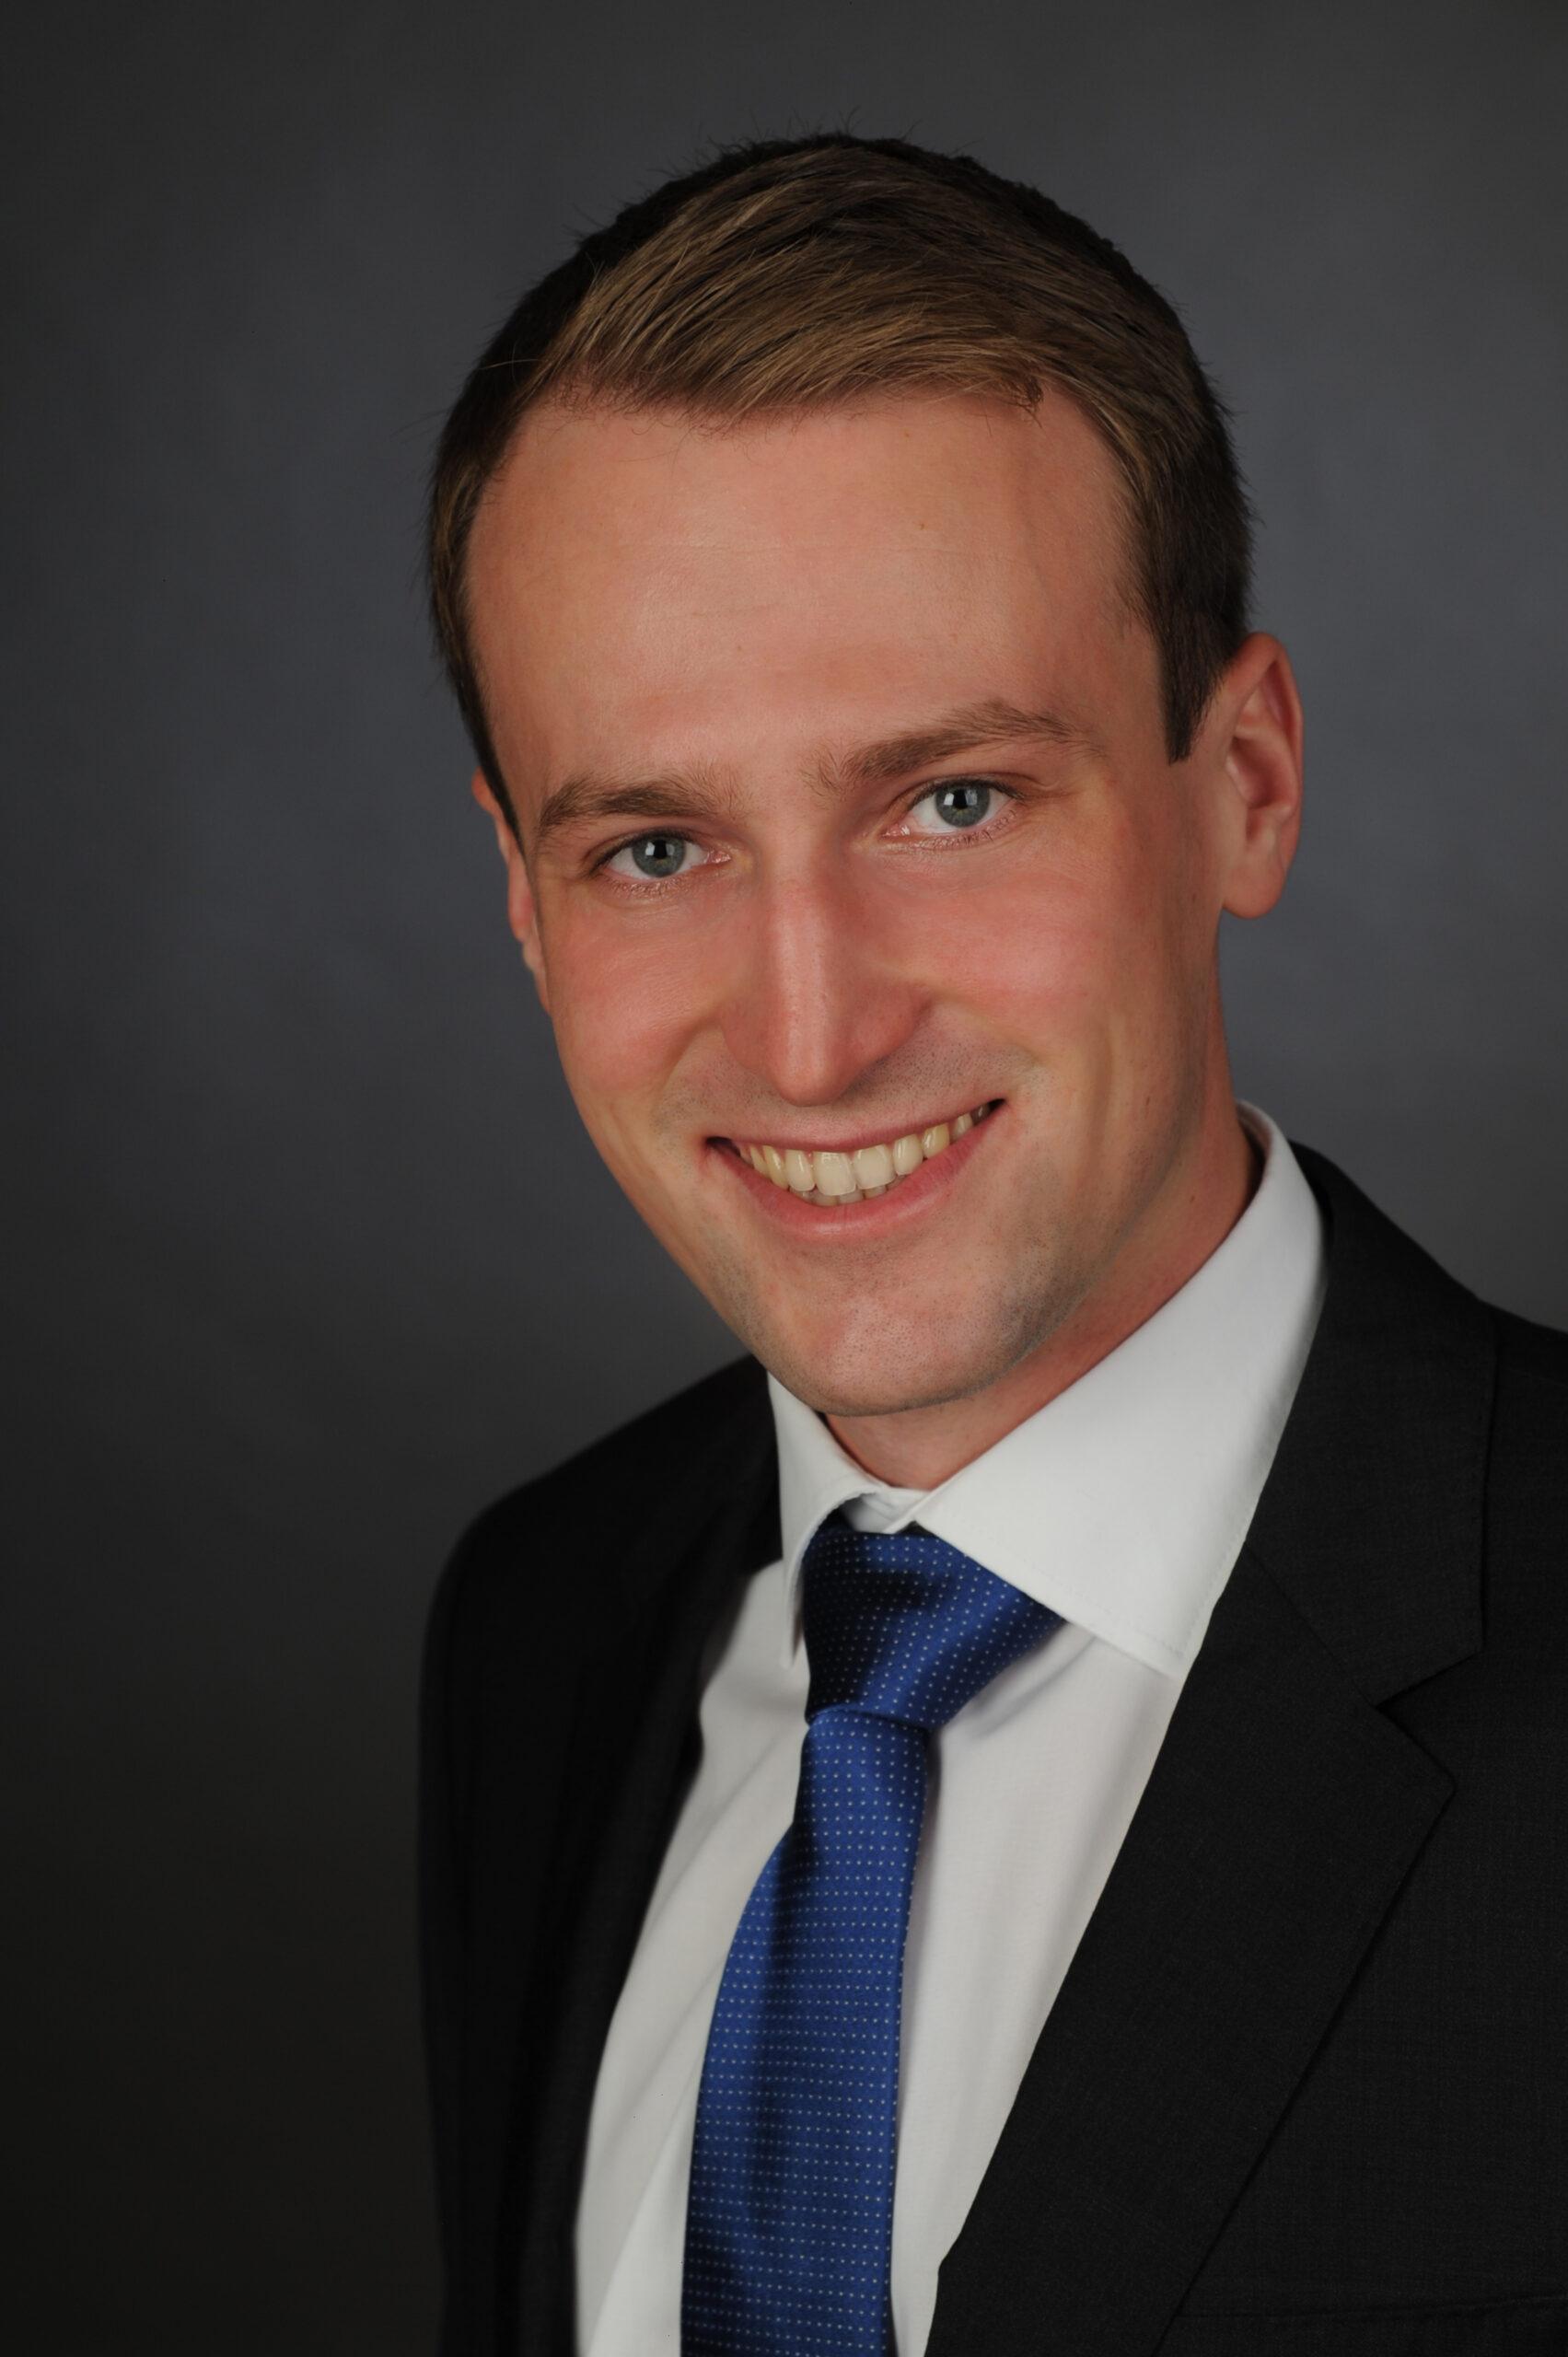 Christian Kober